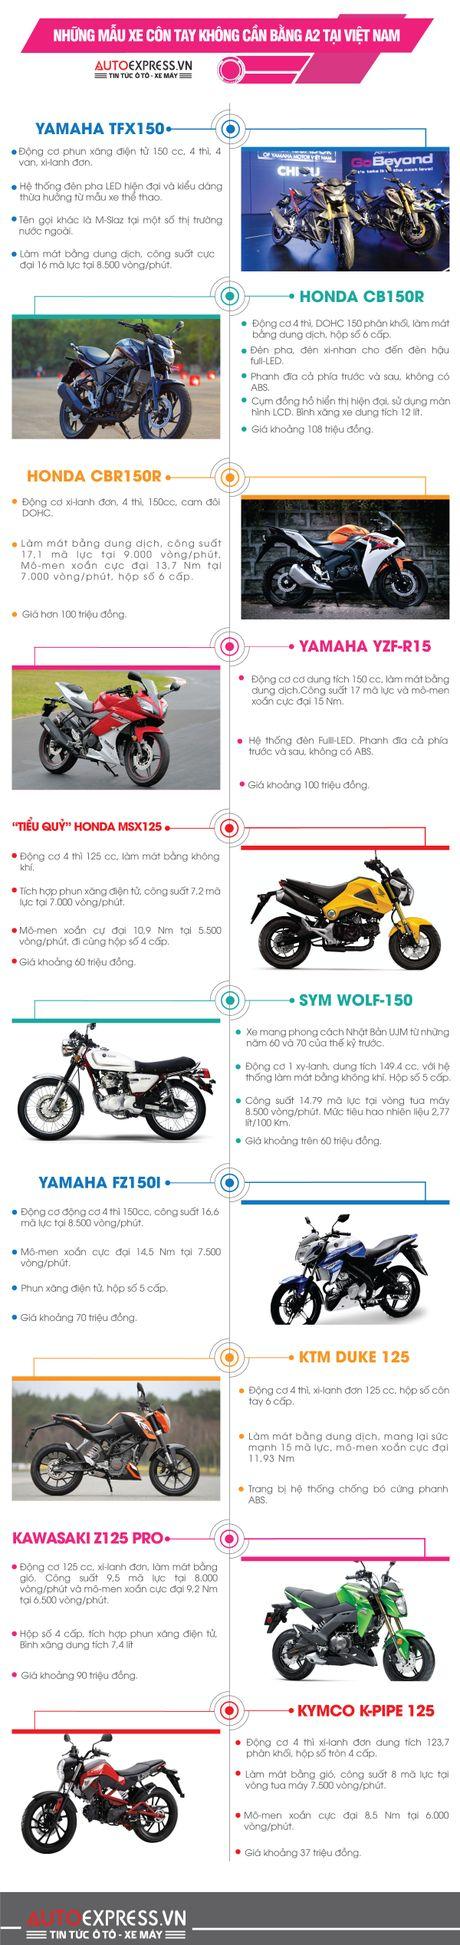 10 lua chon xe con tay khong can bang A2 tai Viet Nam - Anh 1